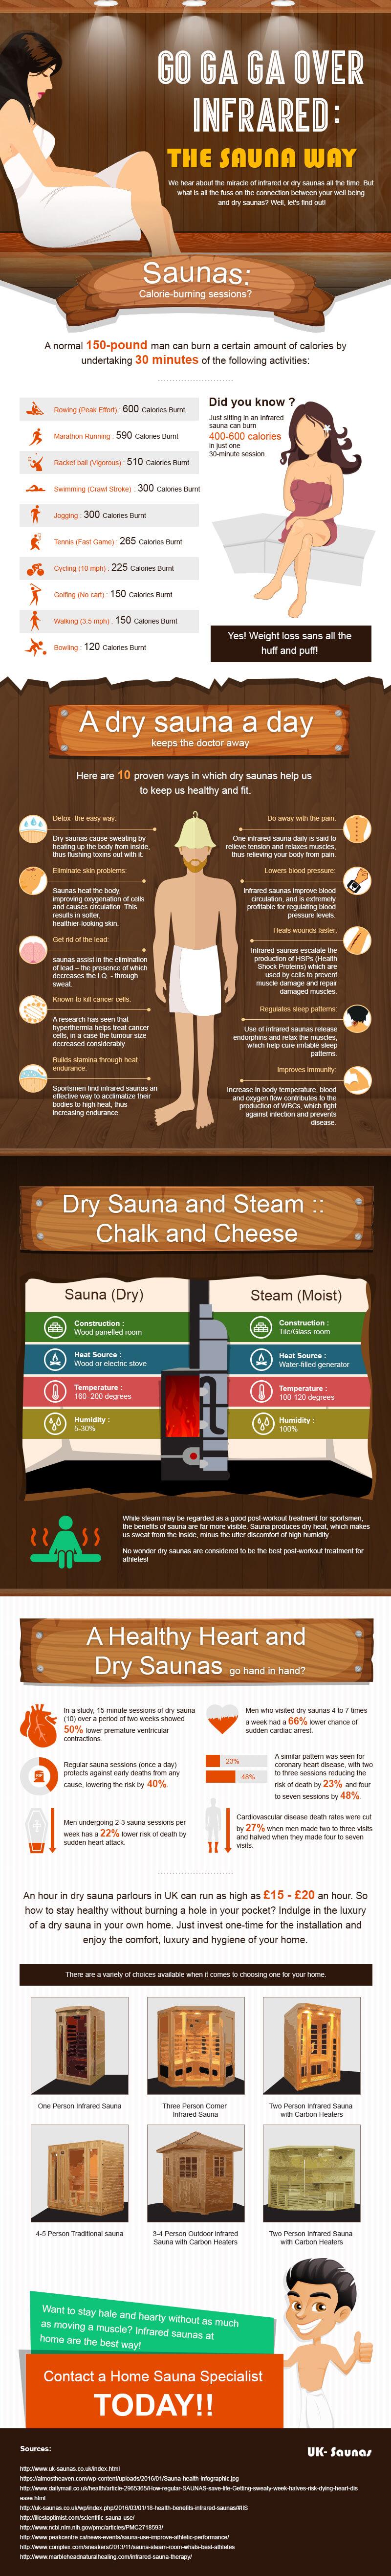 weight loss dry sauna